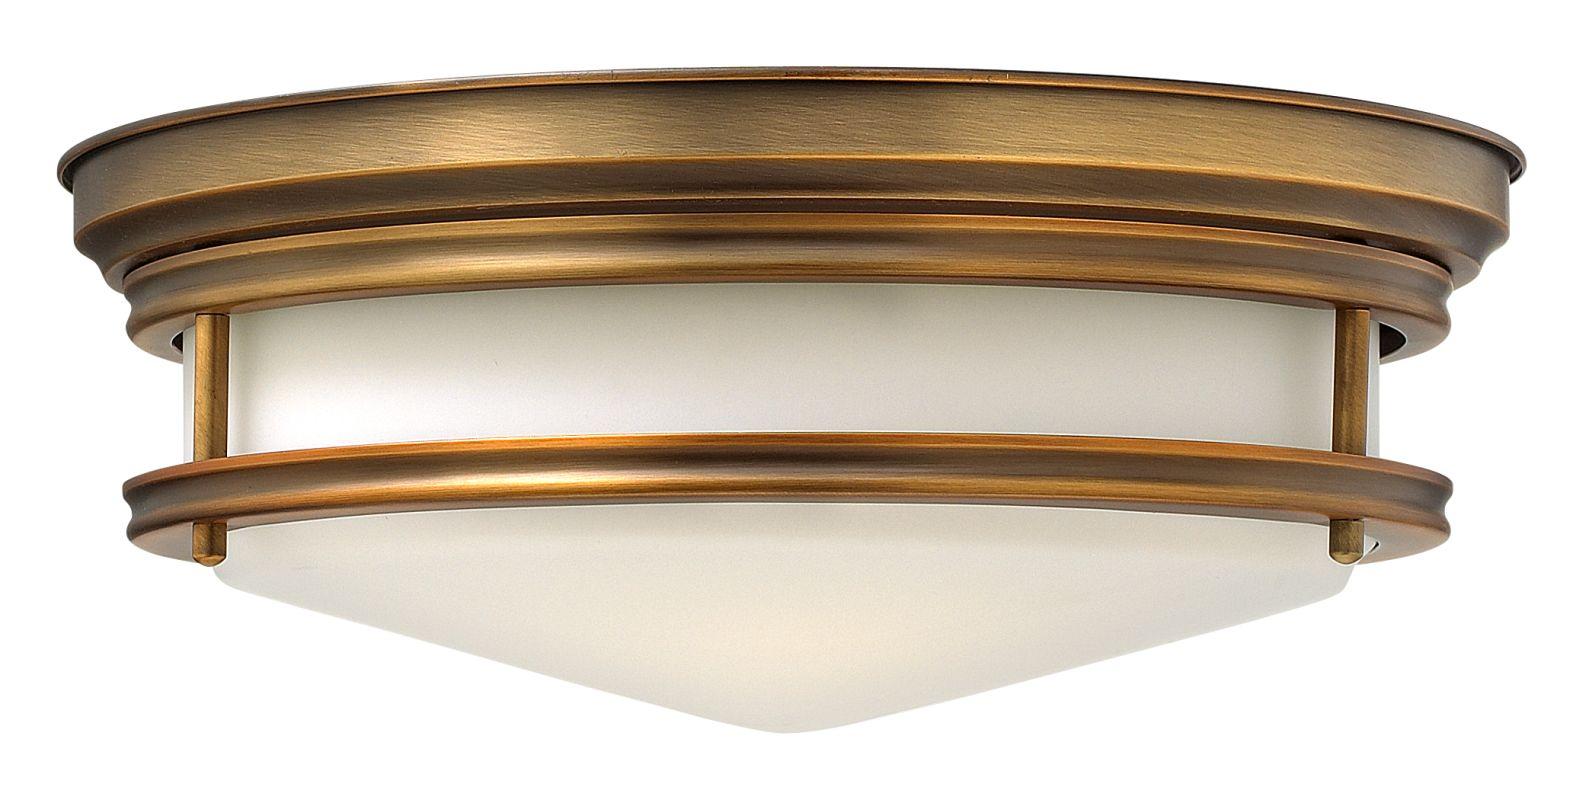 Shop Portfolio 3 Light Vassar Brushed Nickel Bathroom: Hinkley Lighting 3301BR Brushed Bronze 3 Light Indoor